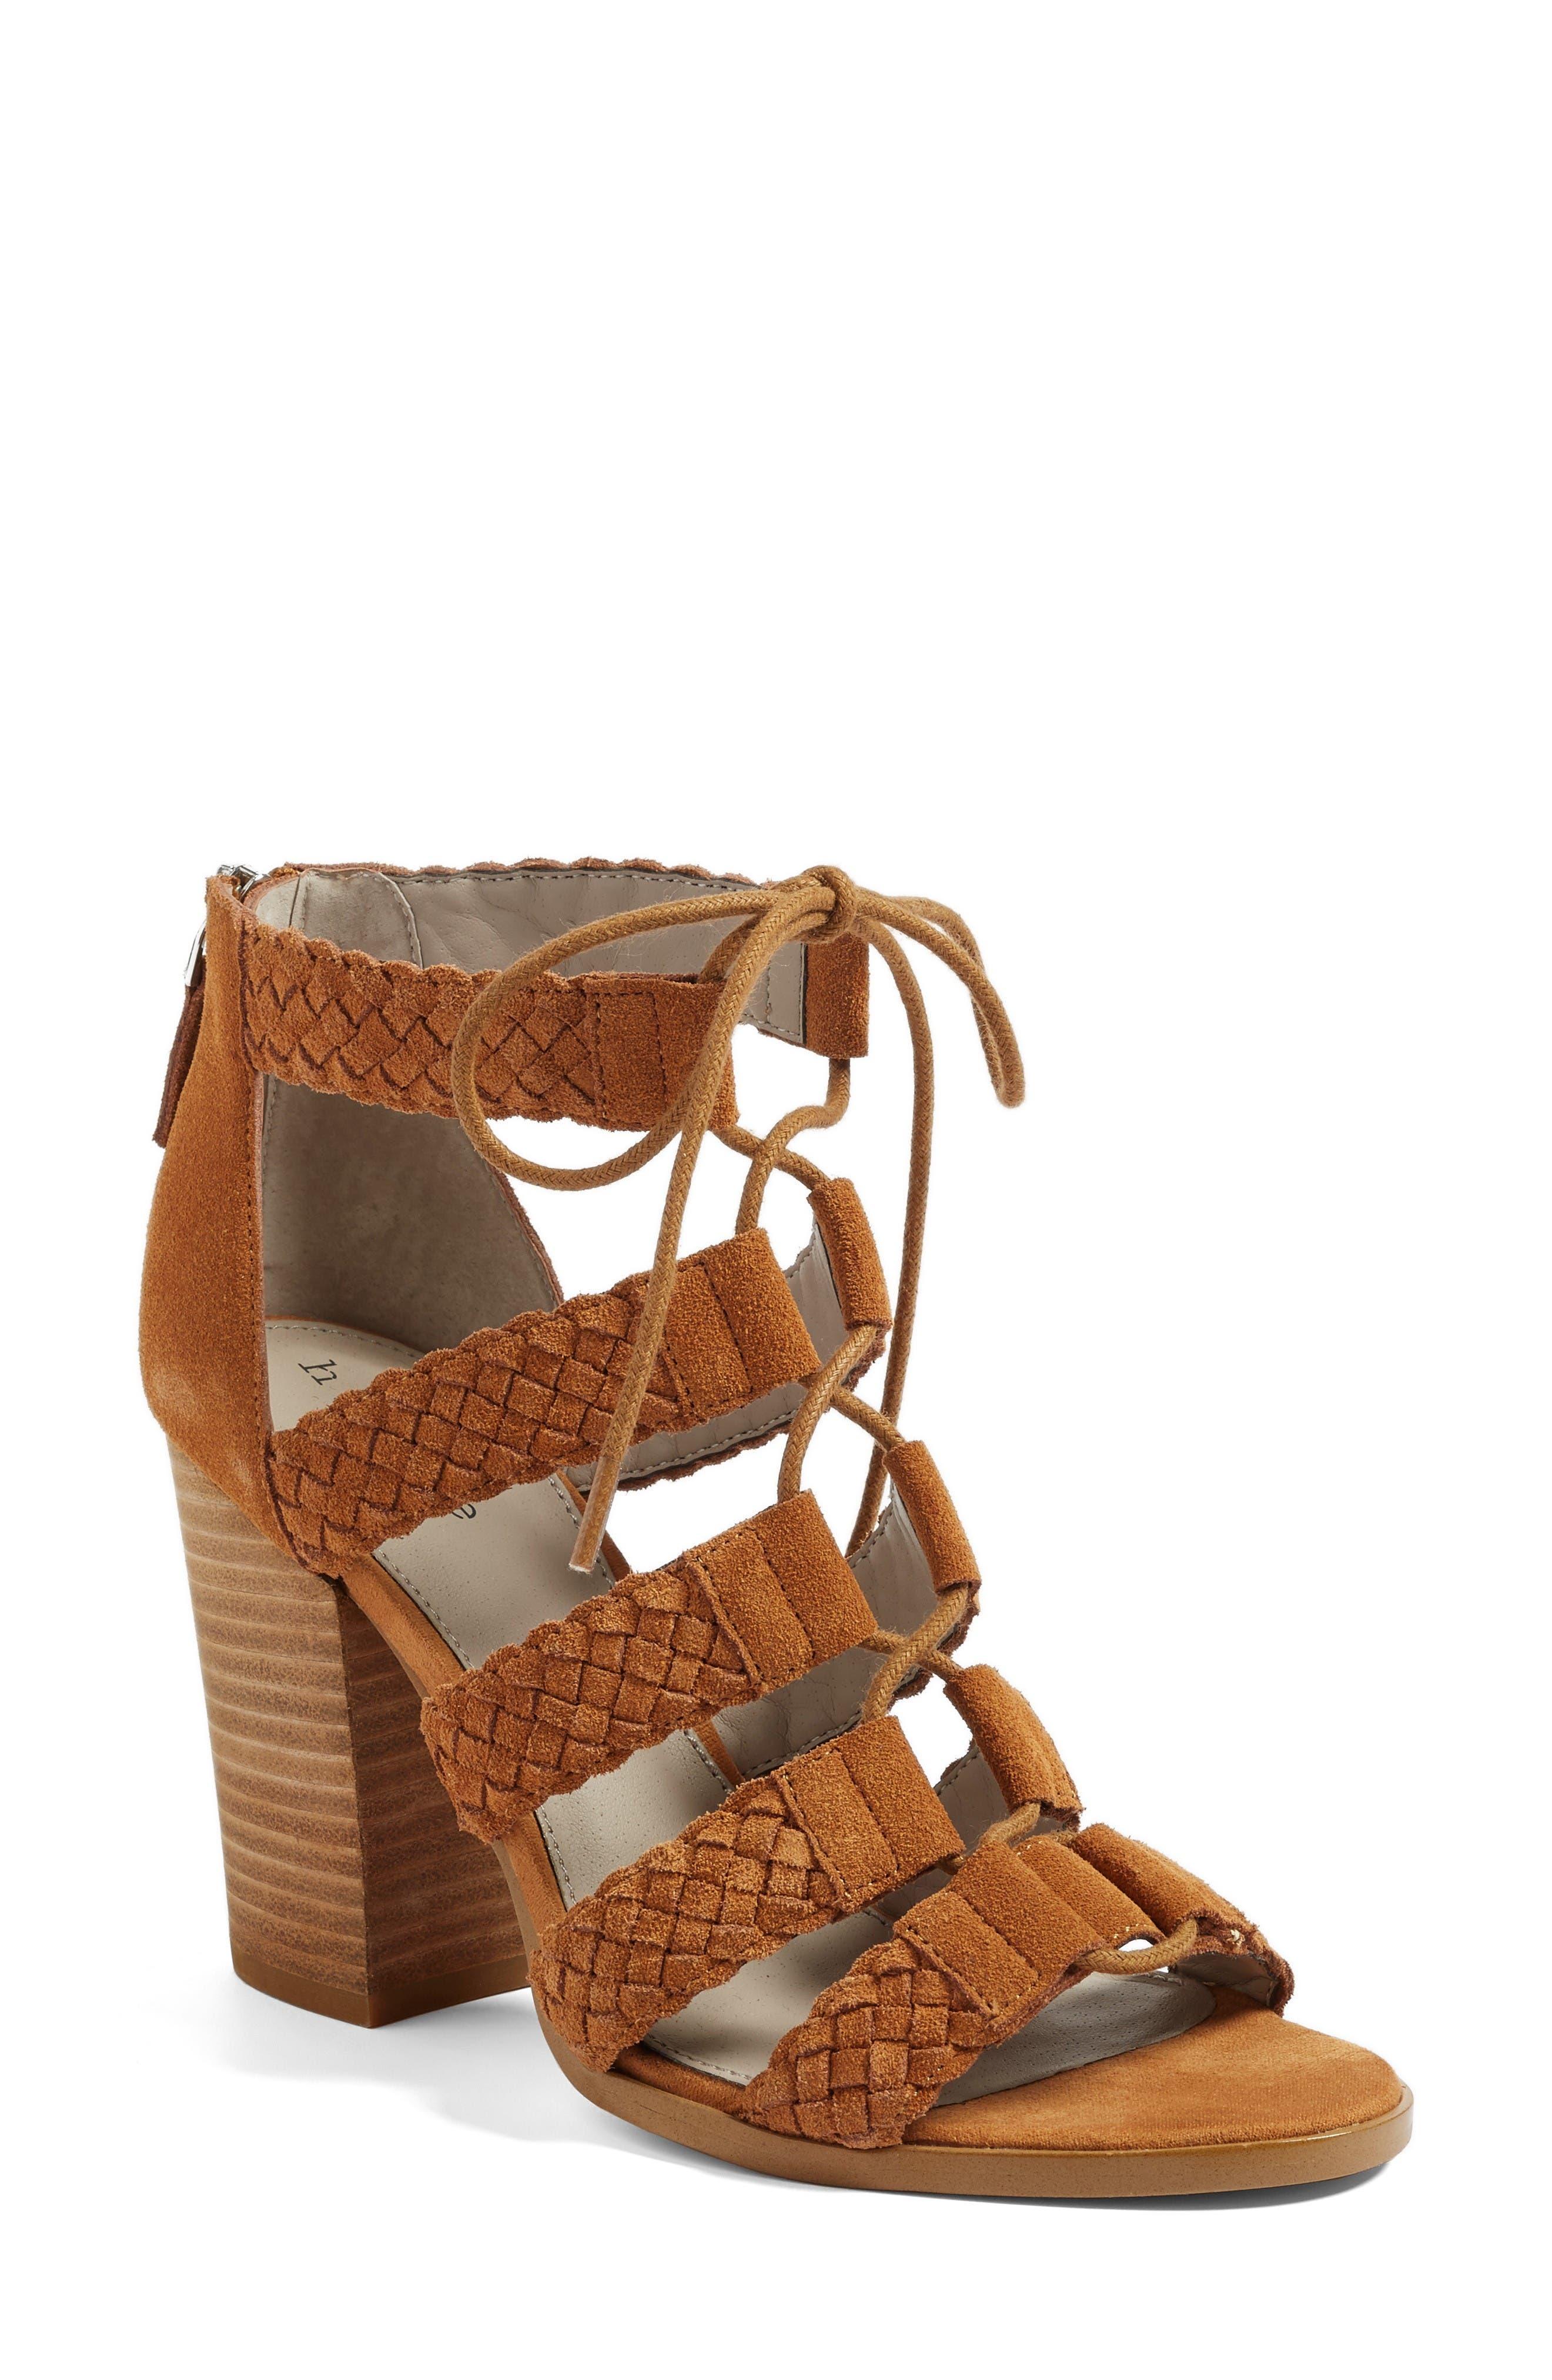 Alternate Image 1 Selected - Hinge Desi Block Heel Sandal (Women)